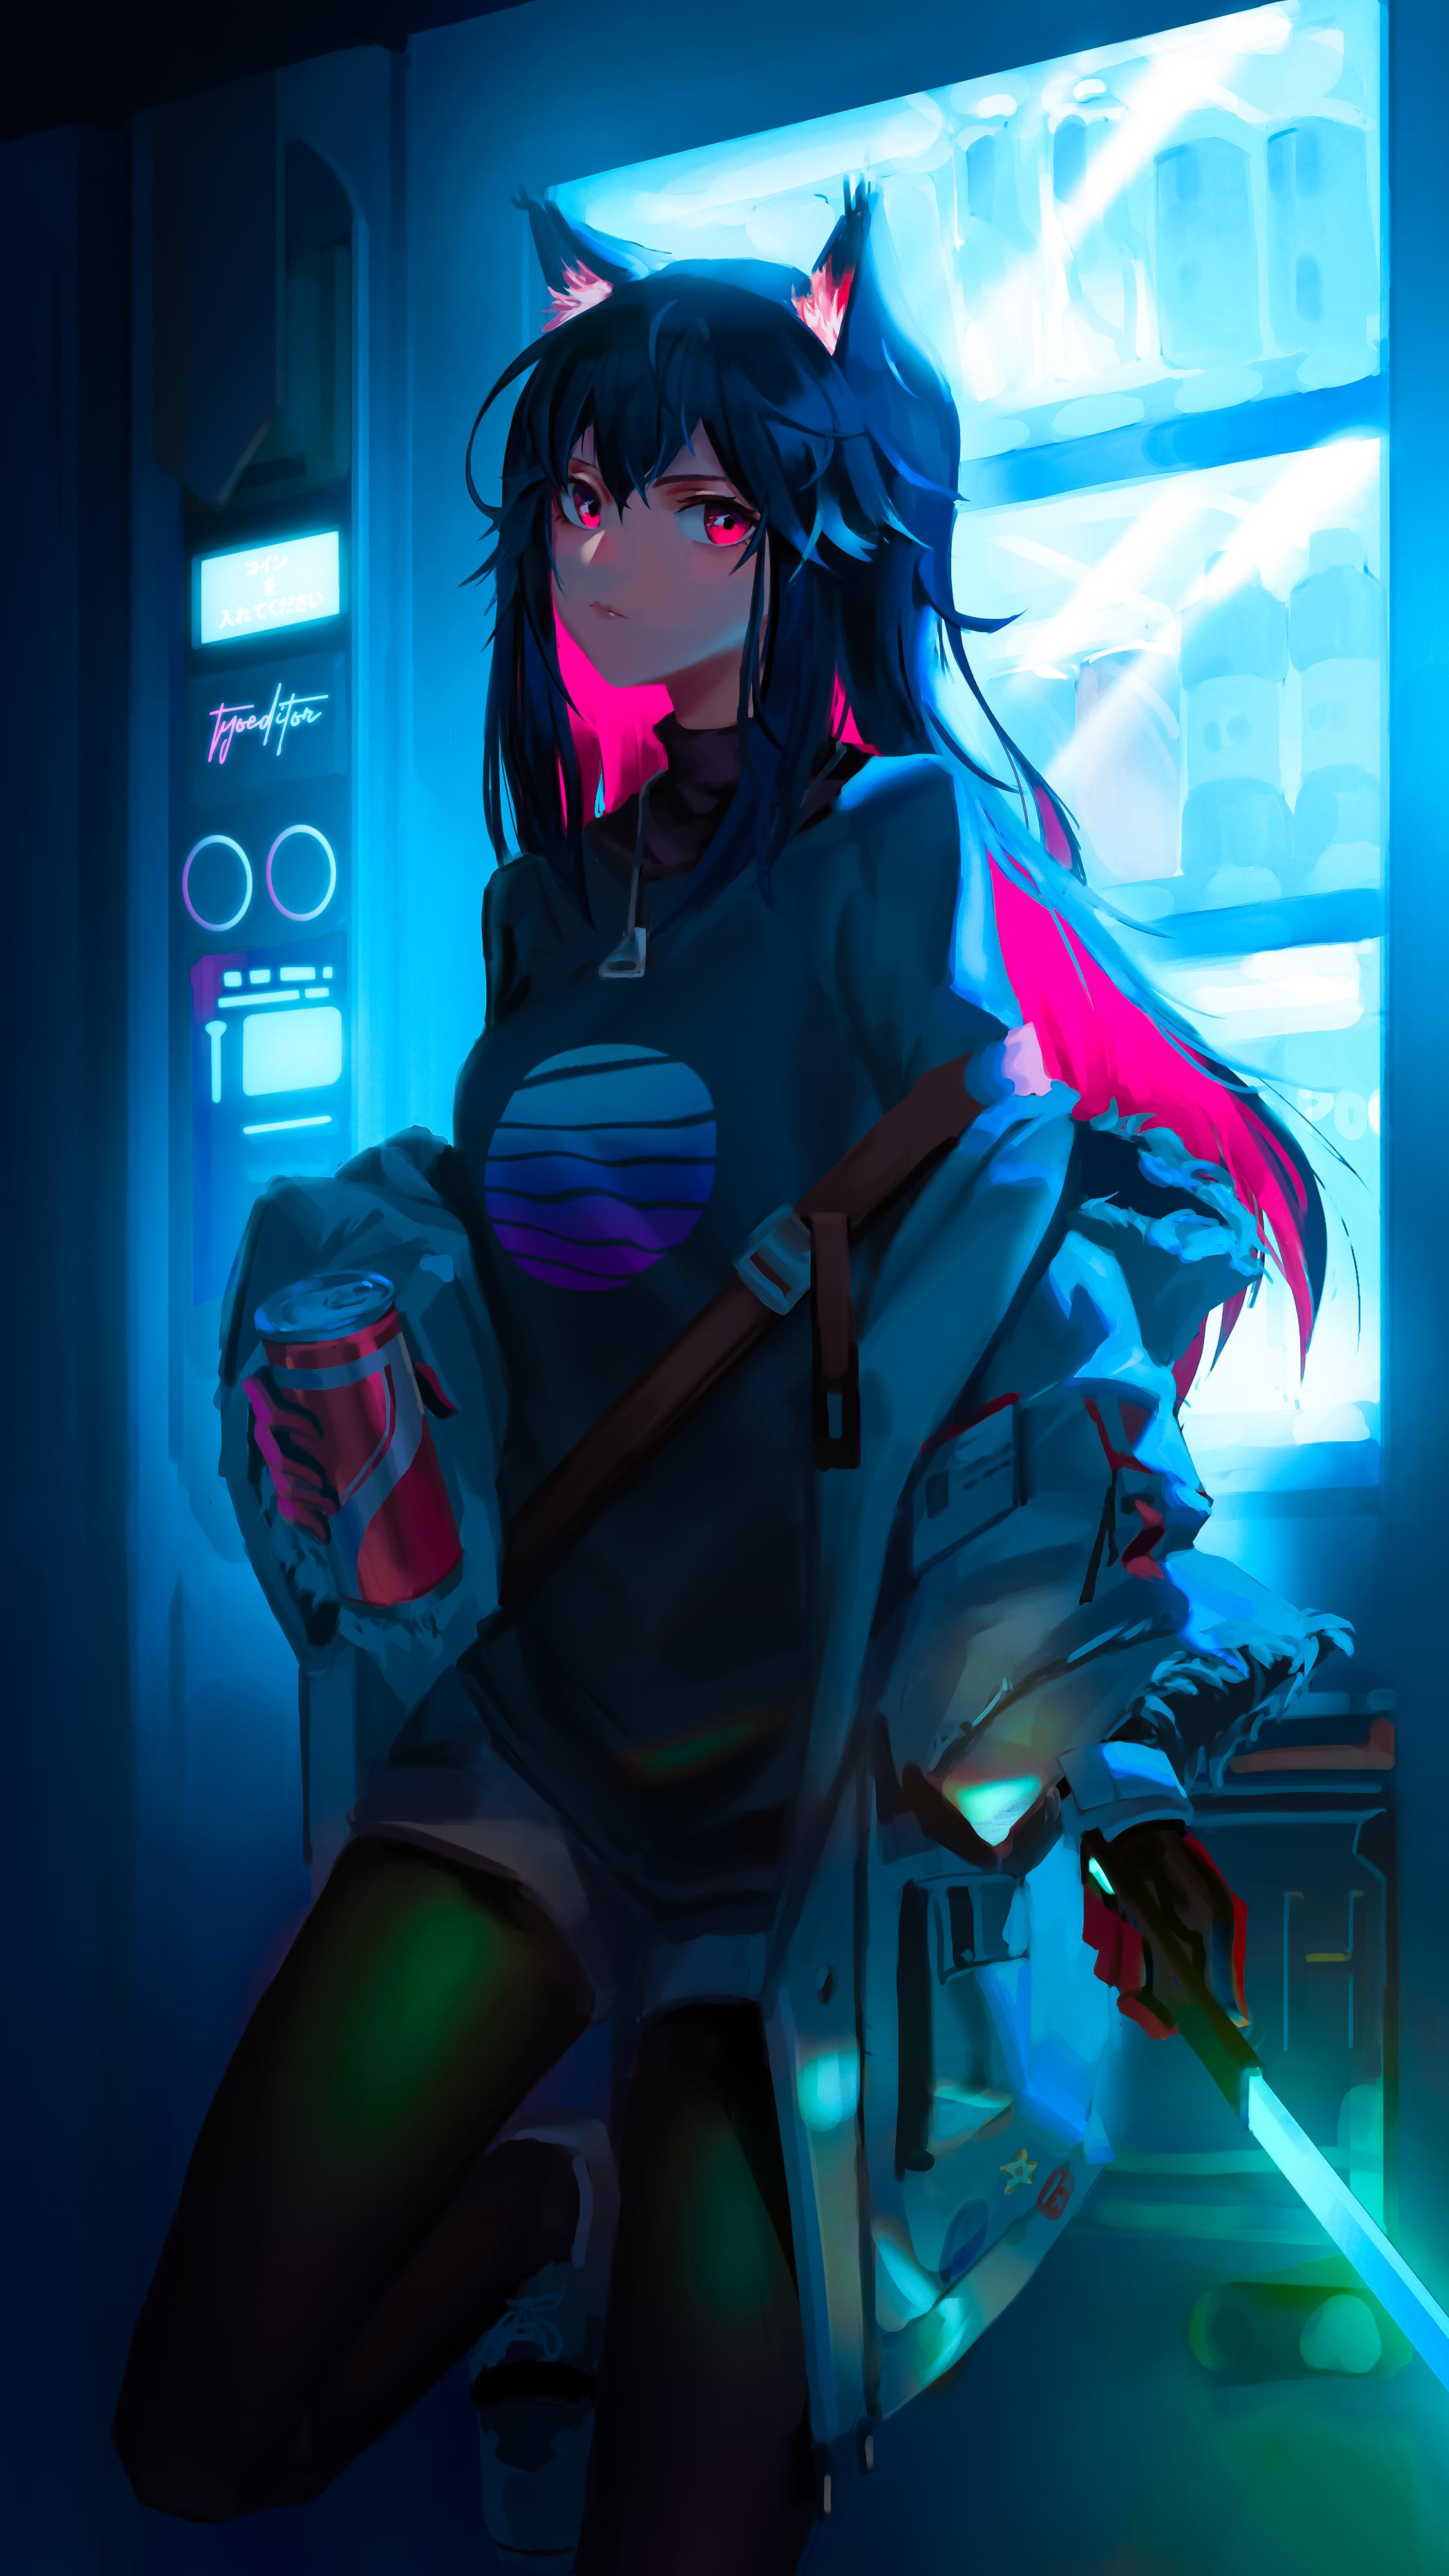 Anime 2250x4000 laser saber drink cyber red eyes black hair pink hair Arknights Texas (Arknights) anime wolf ears wolf girls anime girls